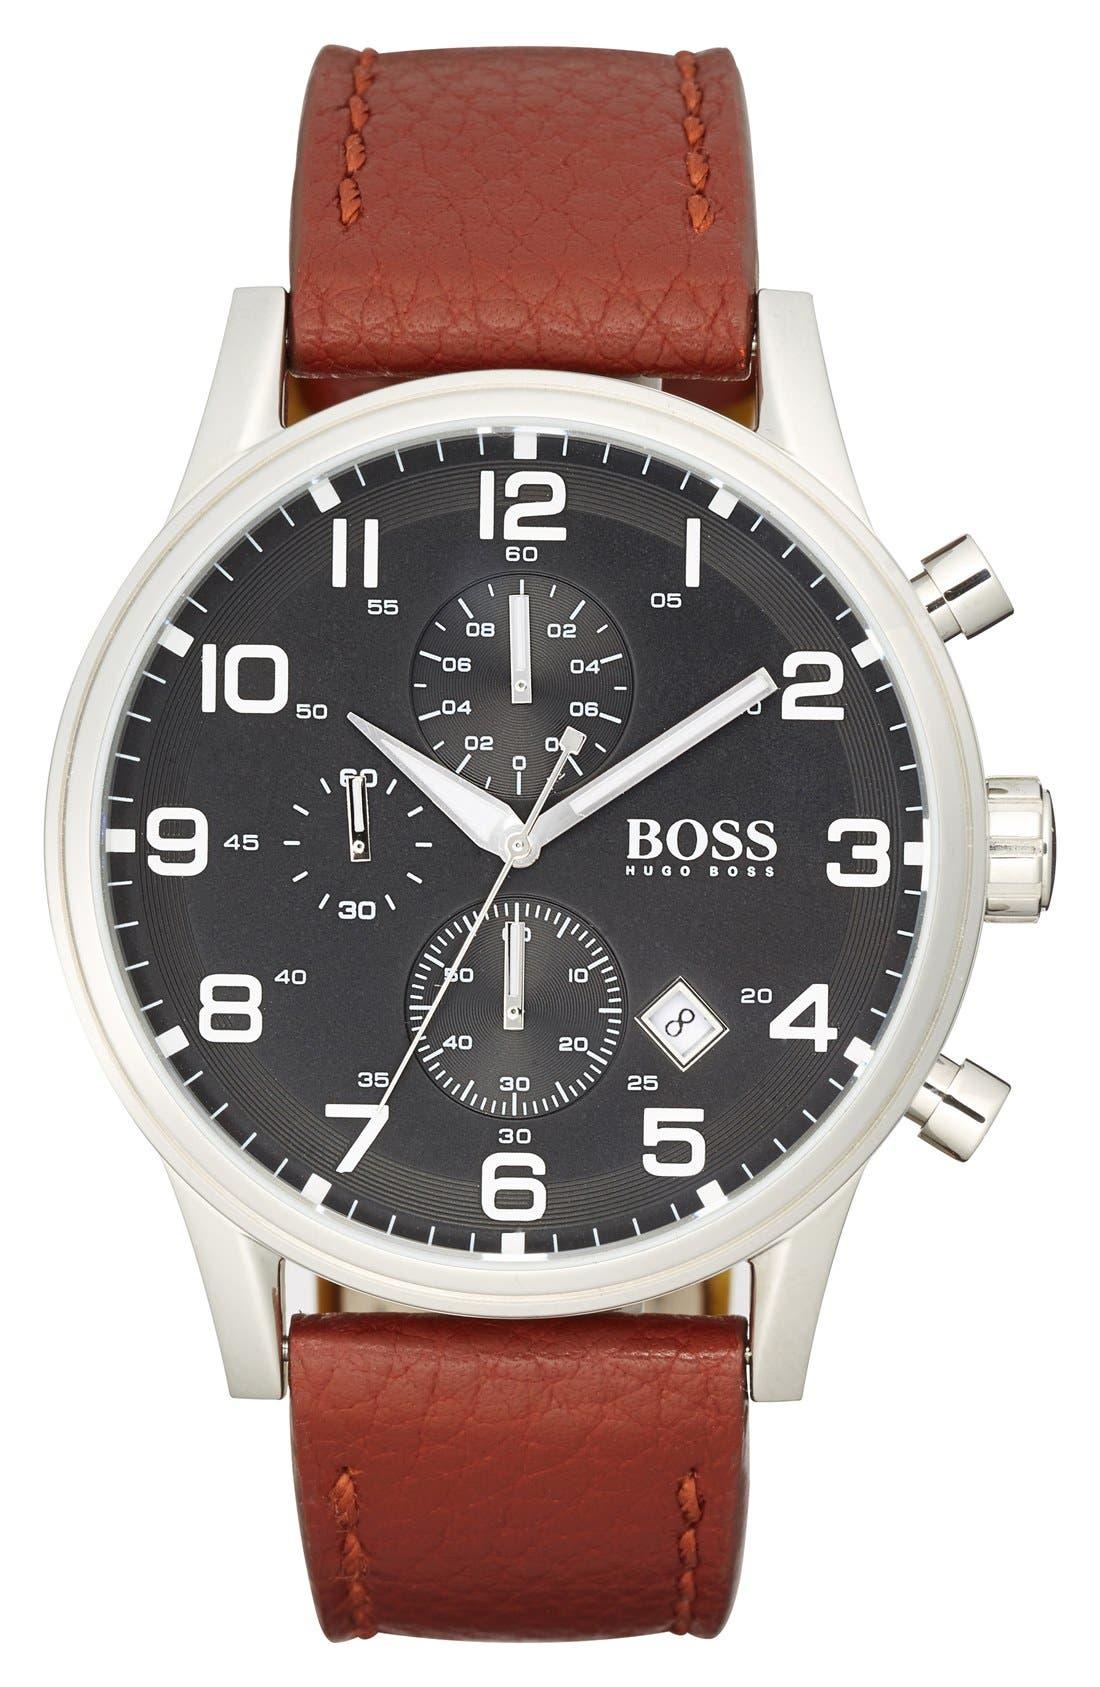 Main Image - BOSS 'Aviator' Chronograph Leather Strap Watch, 44mm